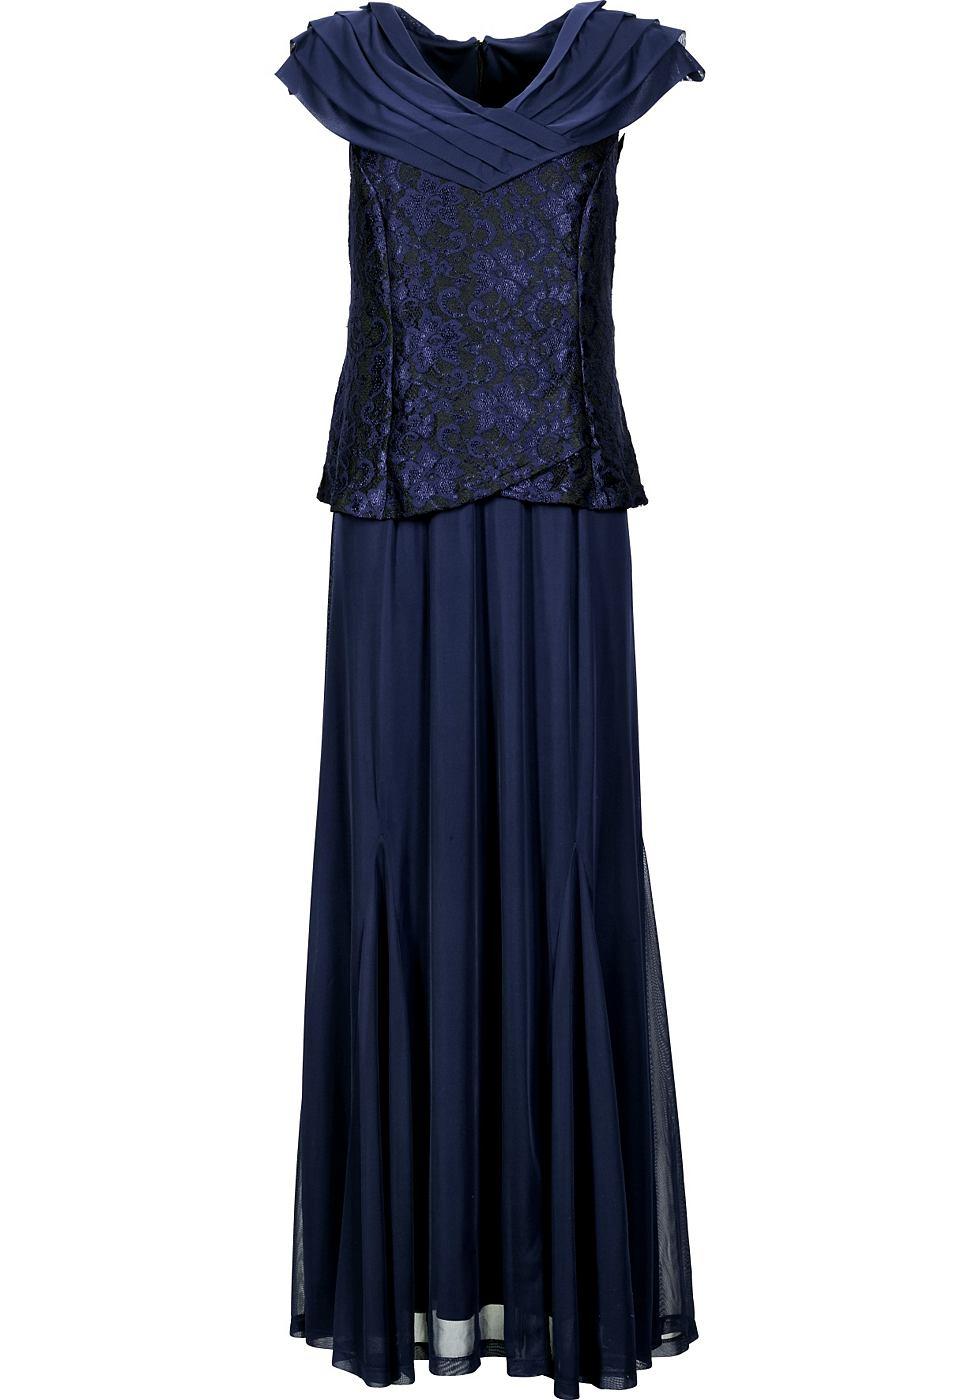 M.I.M jurk met sjaalkraag blauw